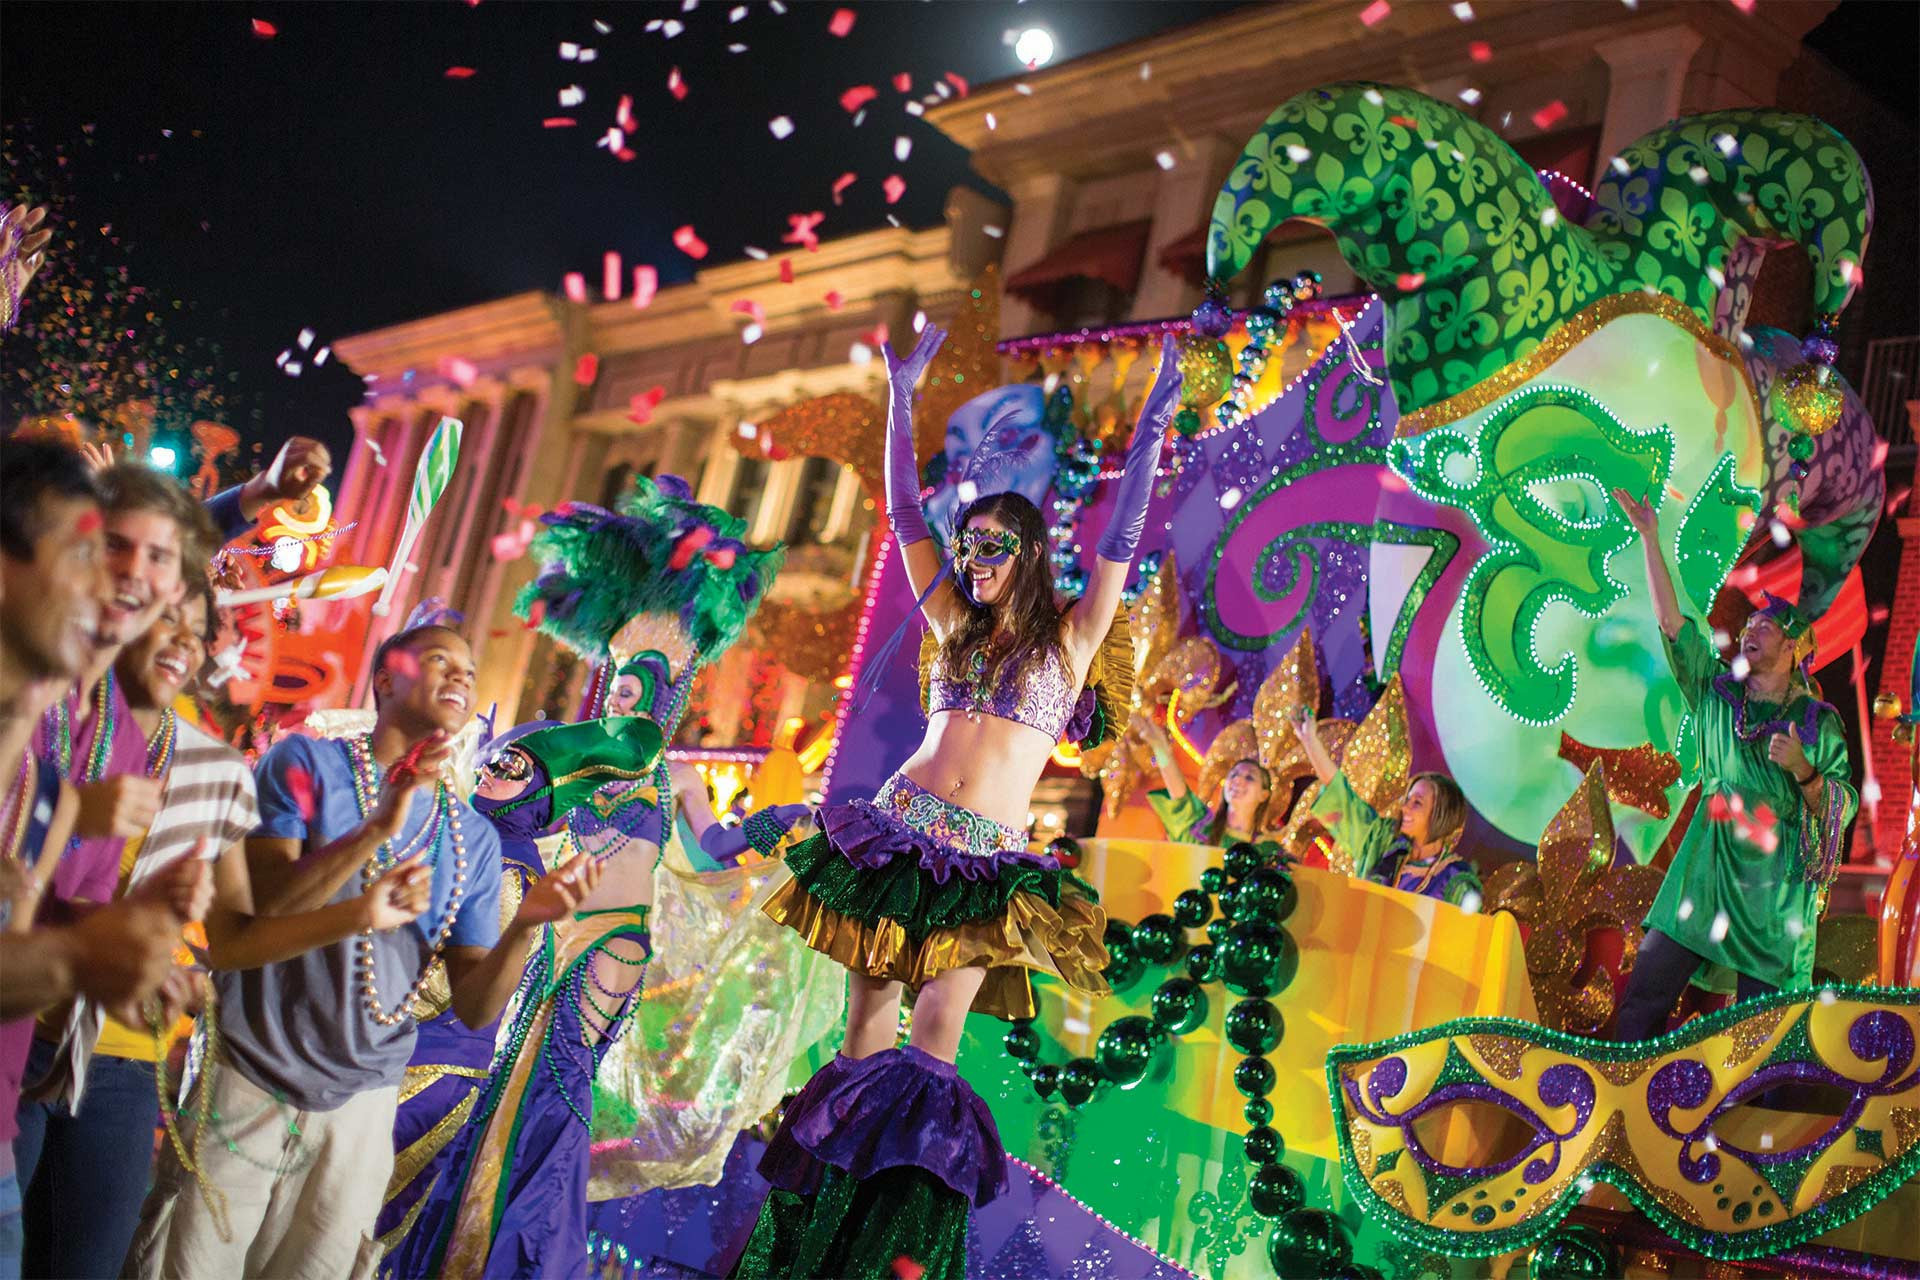 Universal Orlando Mardi Gras Concert Lineup 2020 | Westgate Resorts